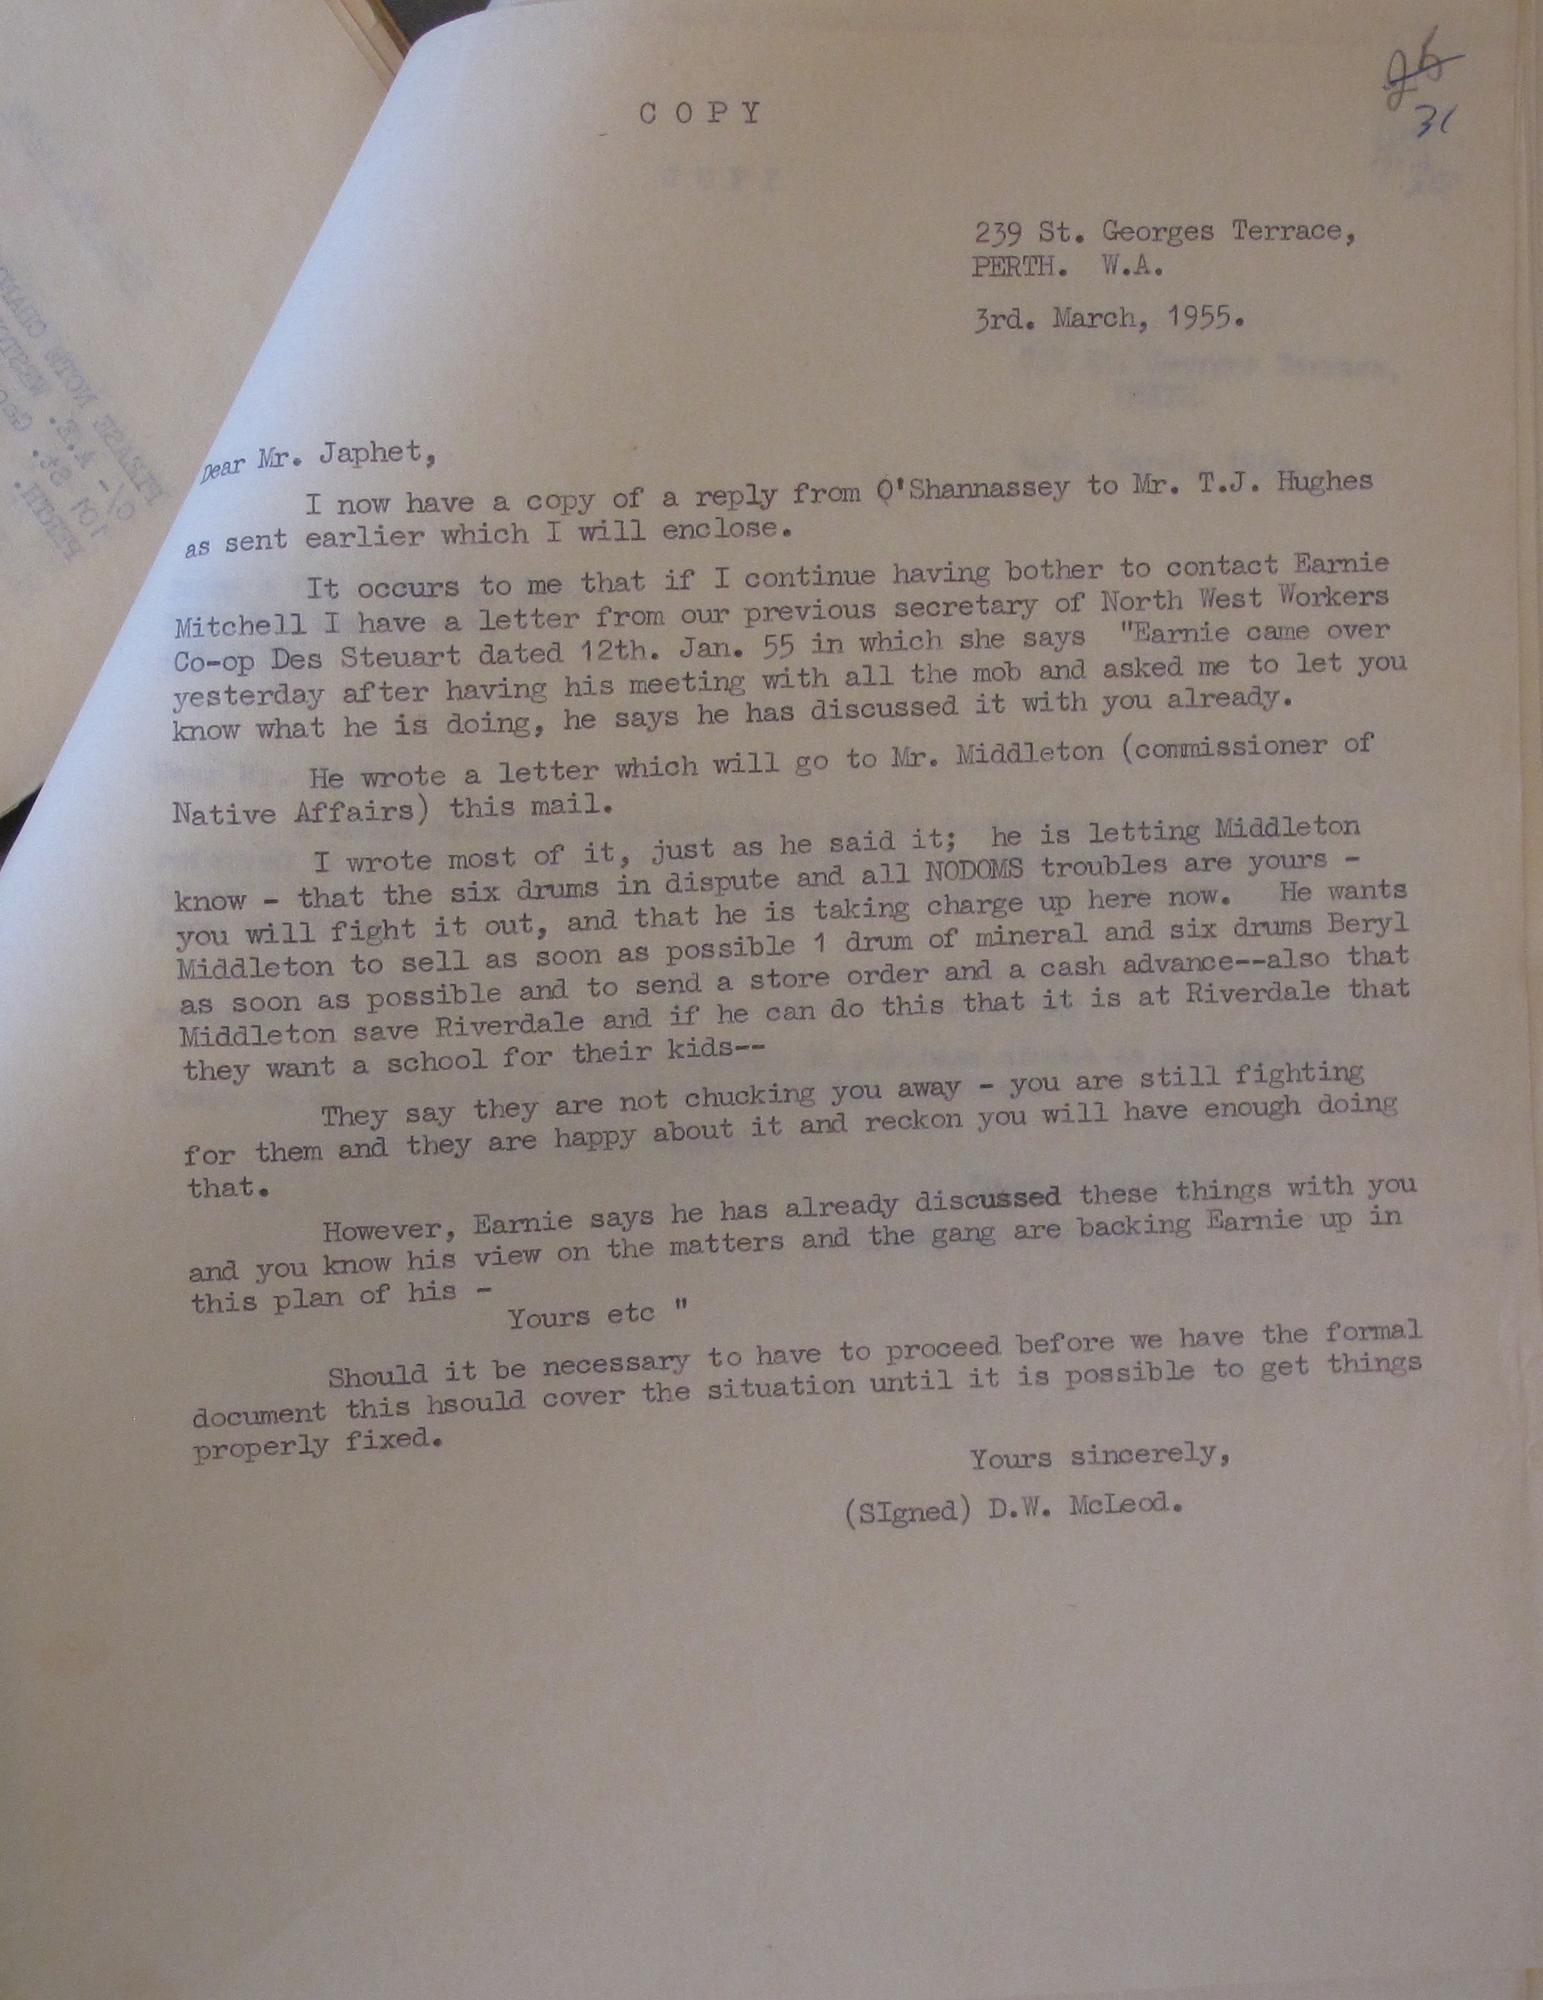 Don McLeod to Japhet, 3 March 1955